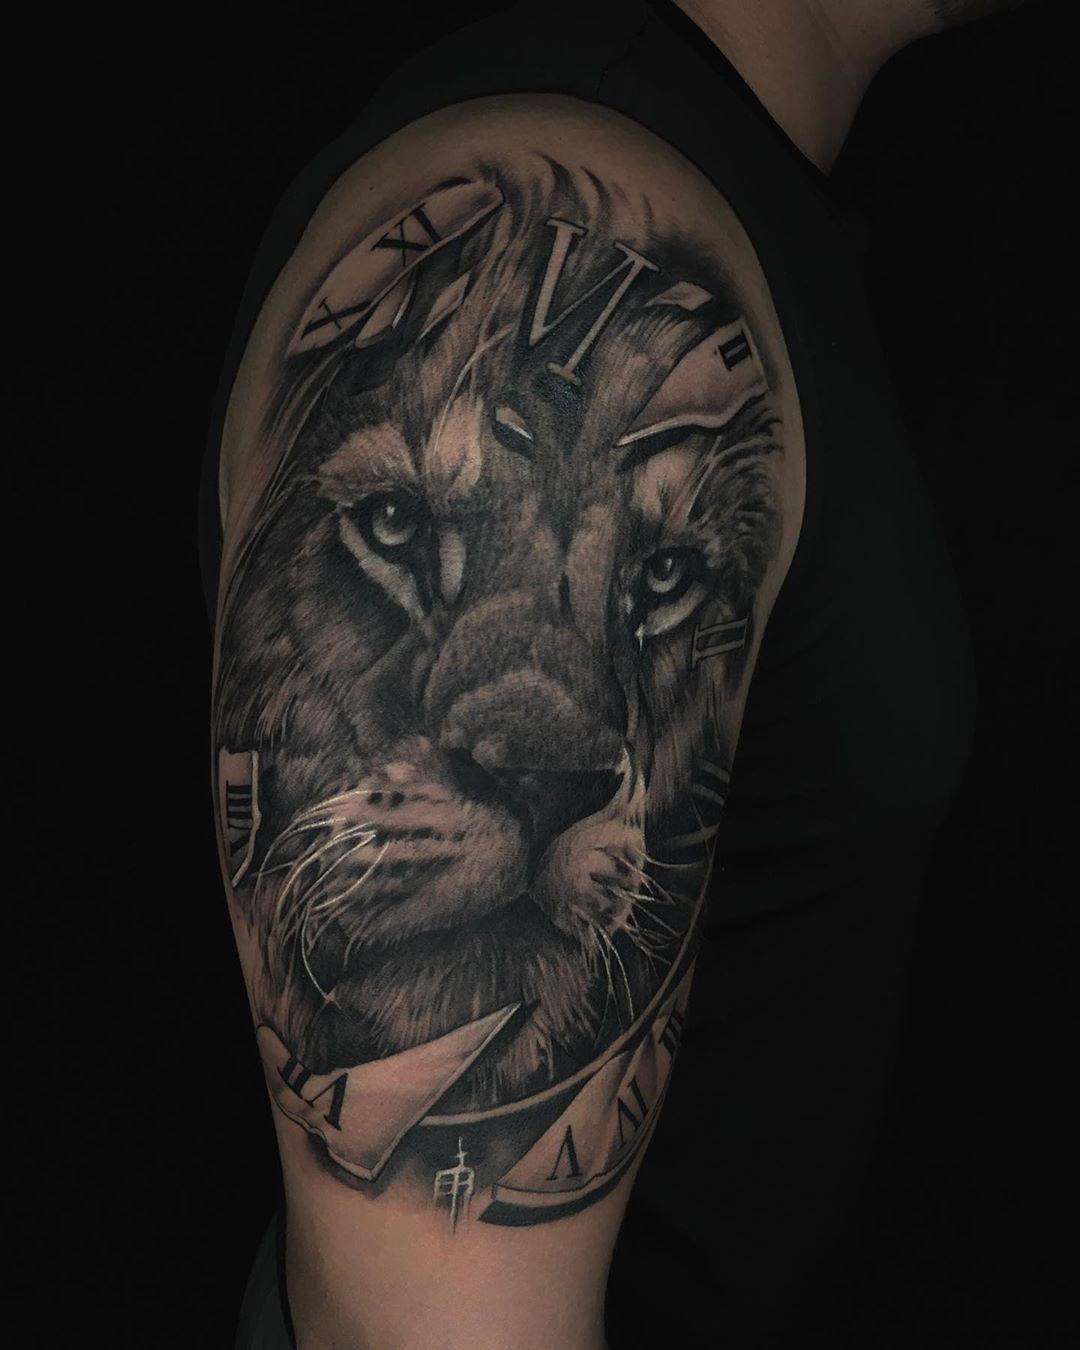 Otro leon hecho en @artoriastattoo . . Citas disponibles 3312833824 . . #blackandgrey #blackandgreytattoo #blackandgreytattoos #black #blacktattoos #blacktattoo #realistictattoo #realistic #lion #liontattoo #liontattoos #ink #inked #tattoo #tattoos #inked